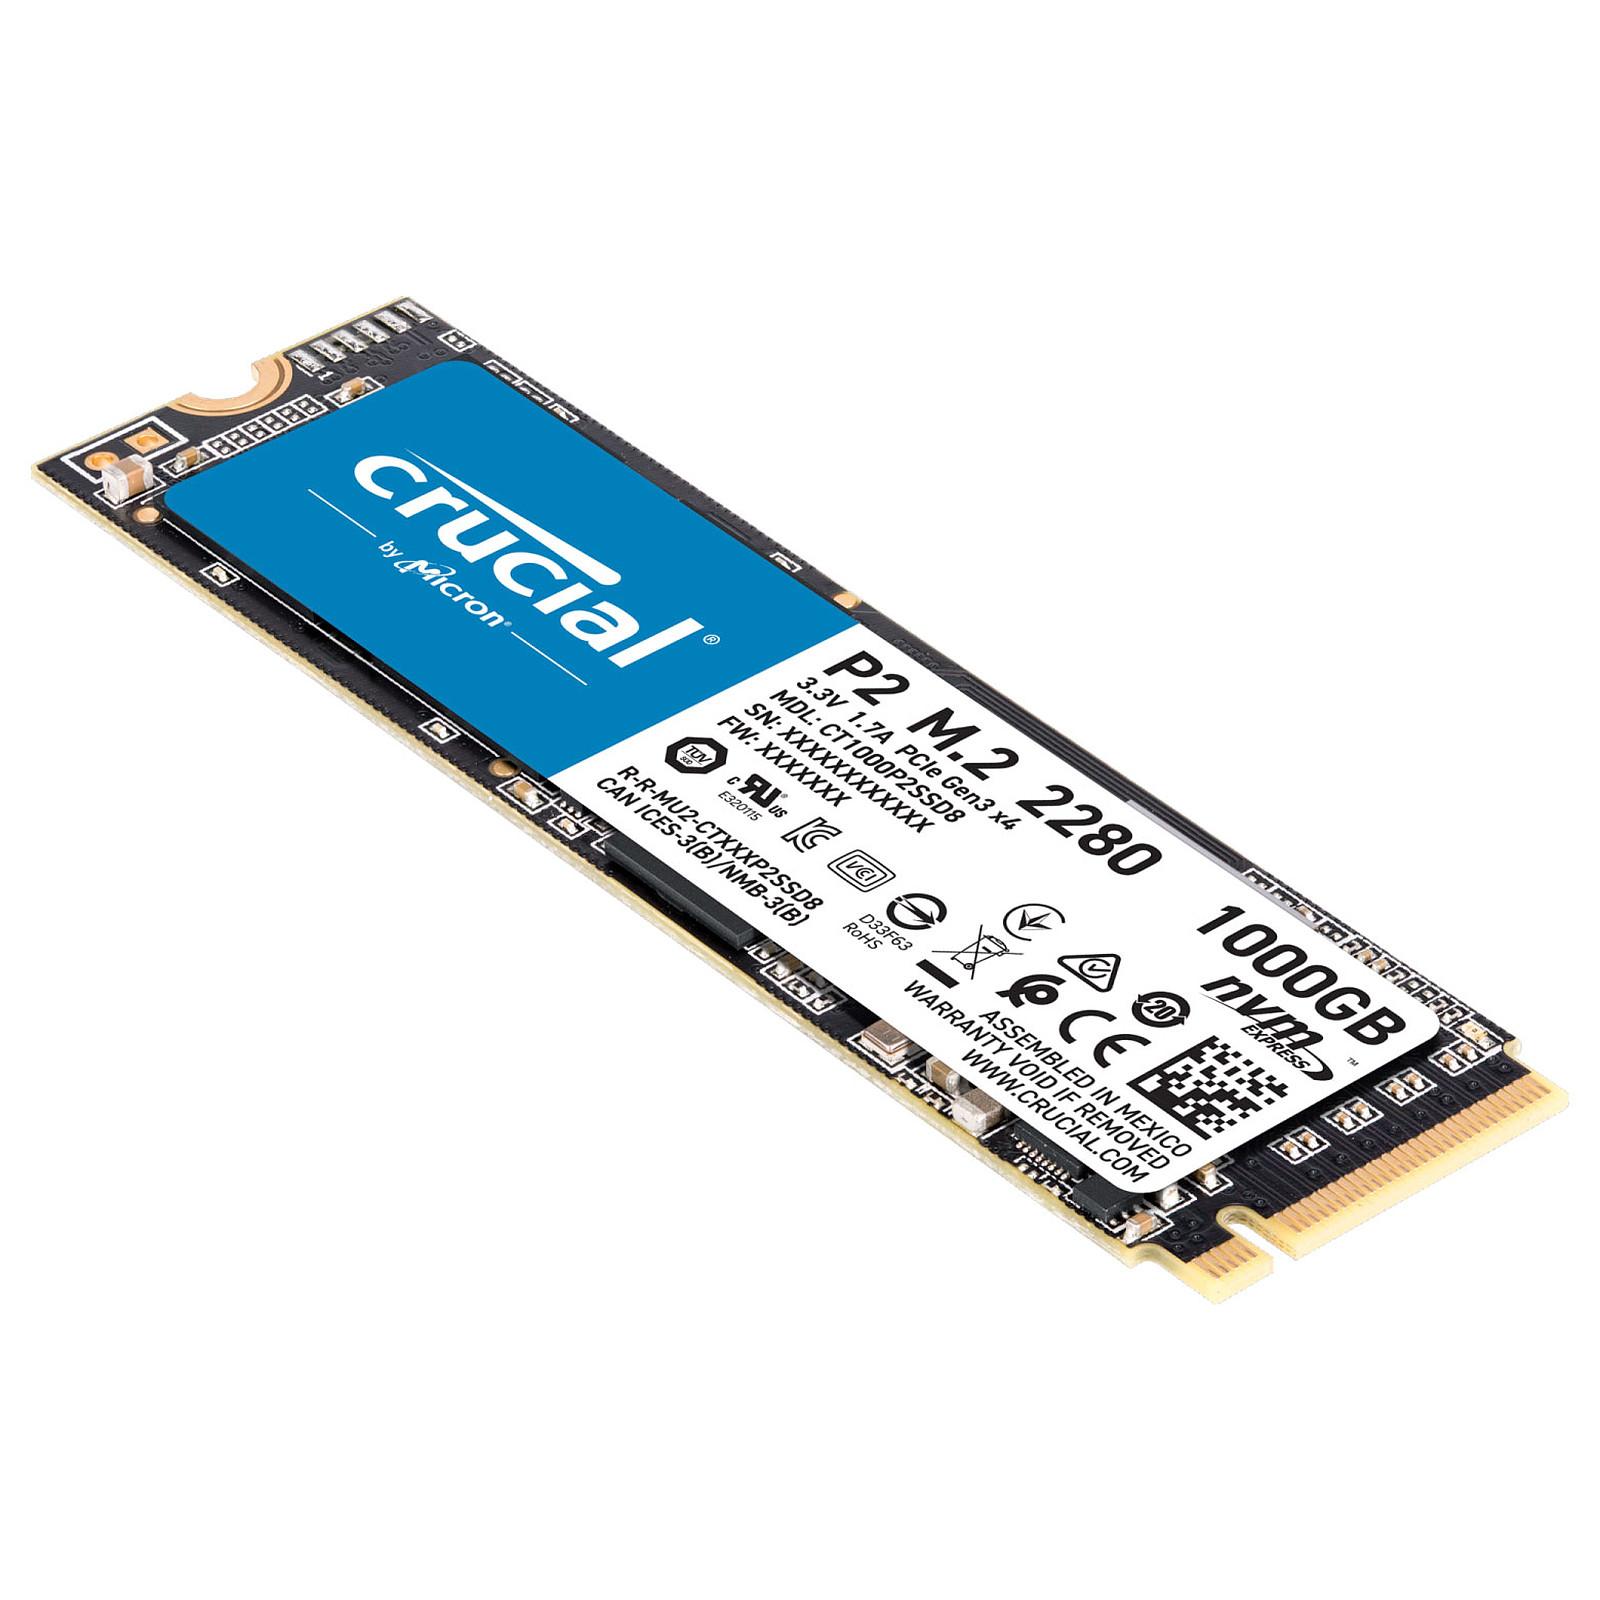 Crucial P2 960Go-1To M.2 - Disque SSD Crucial - Cybertek.fr - 2